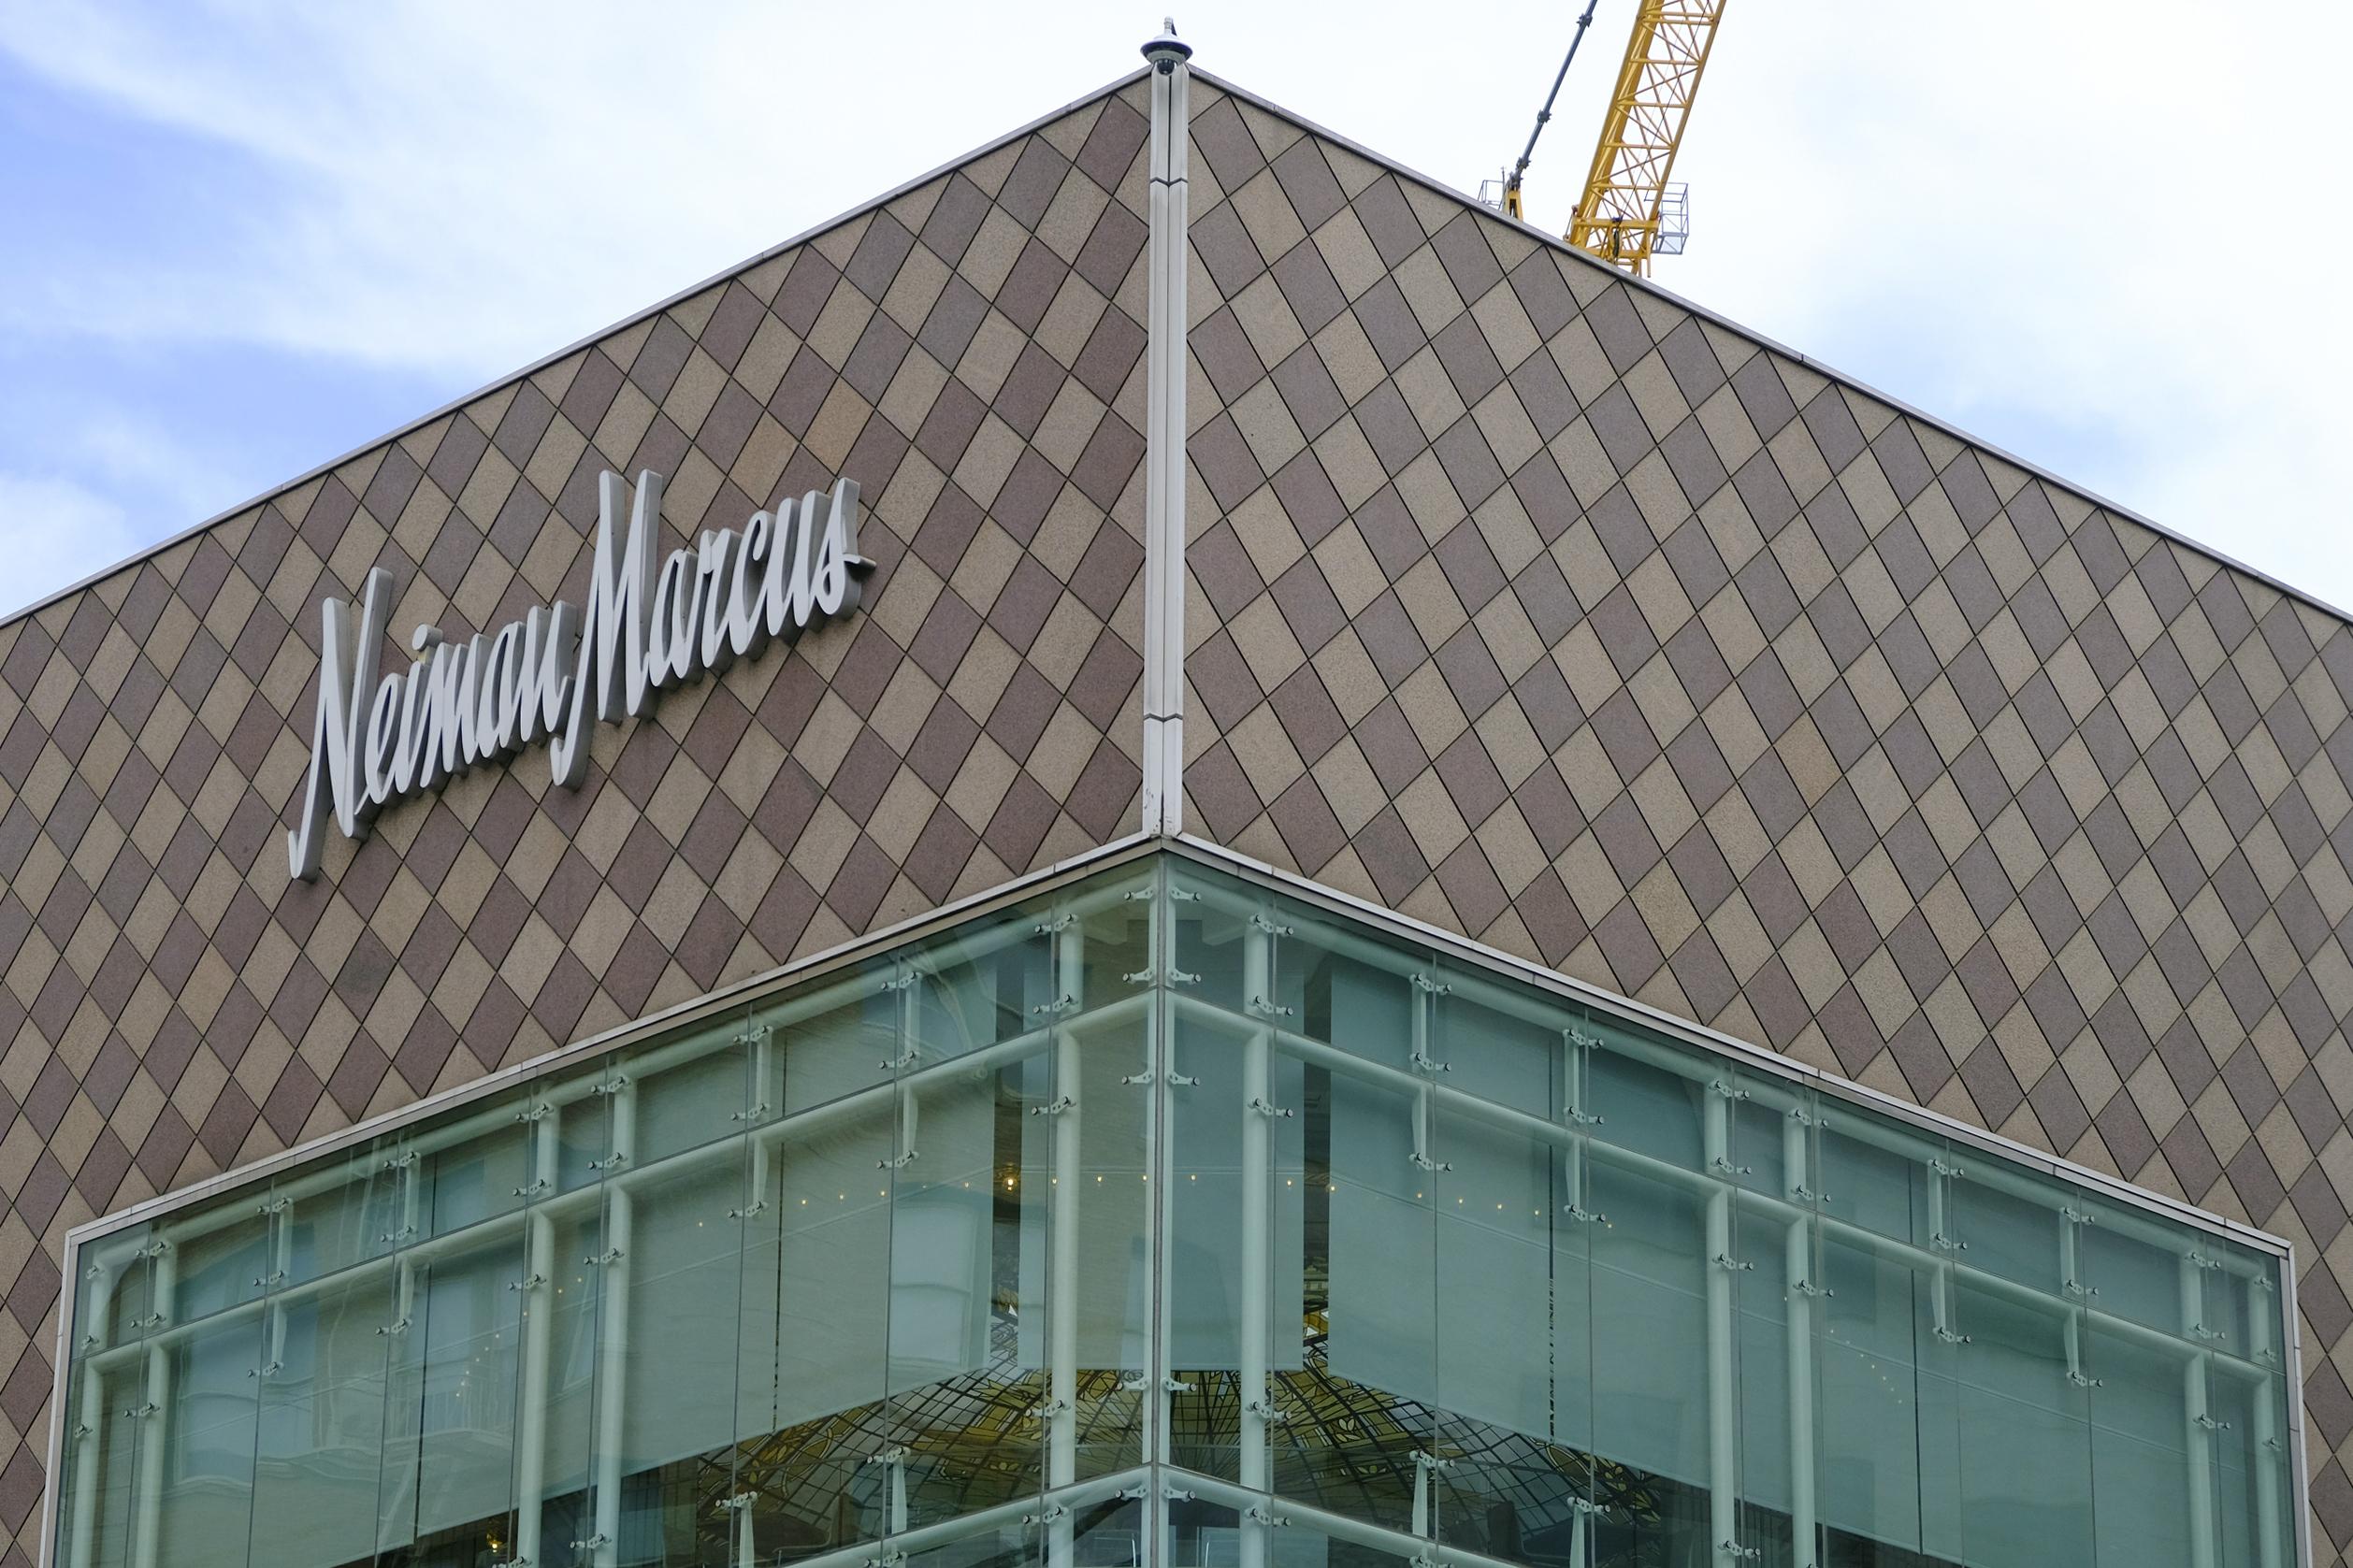 Neiman Marcus Becomes 2nd Major Retailer To Seek Chapter 11 Wpri Com